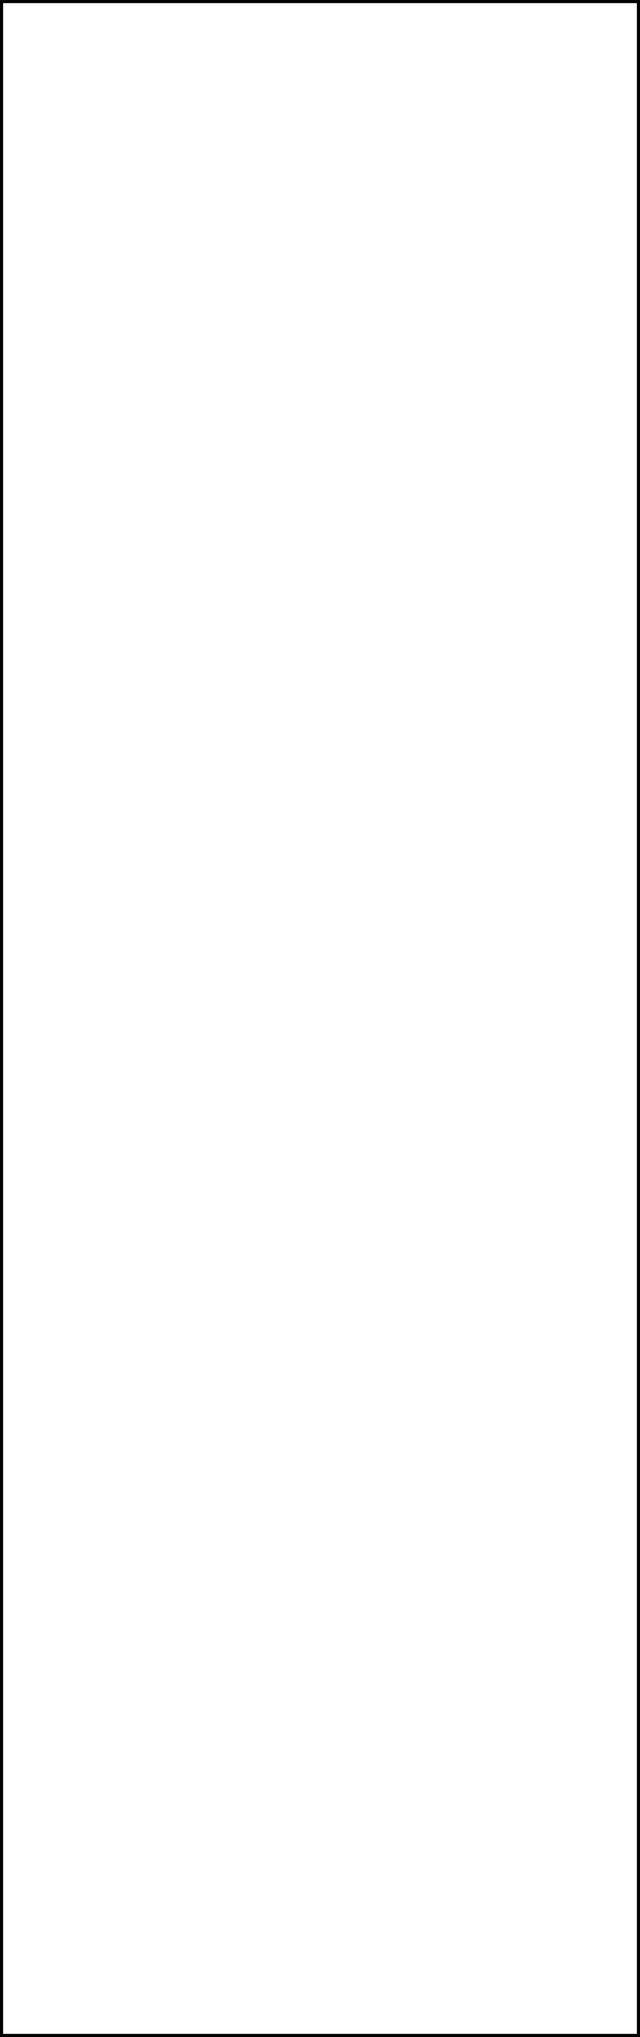 Free Printable Upper Case Alphabet Template: I - Free Printable Upper Case Alphabet Template